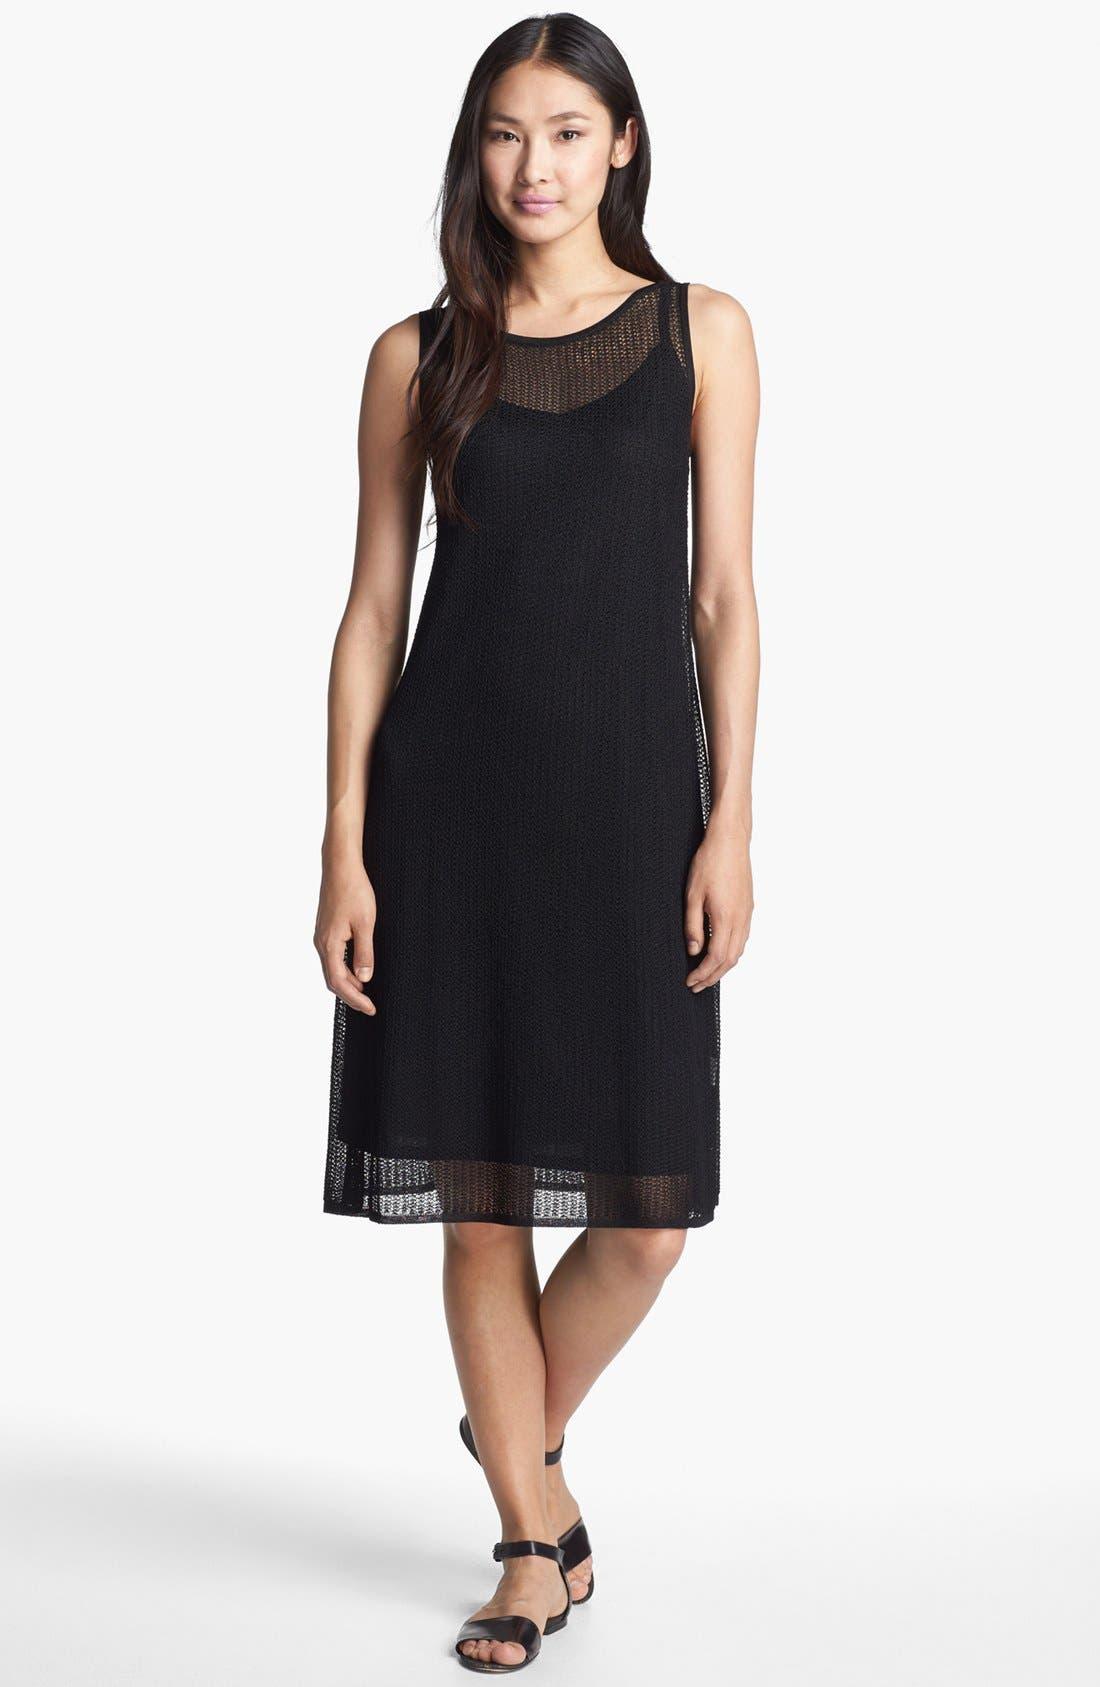 Main Image - Eileen Fisher Mesh Knit Dress